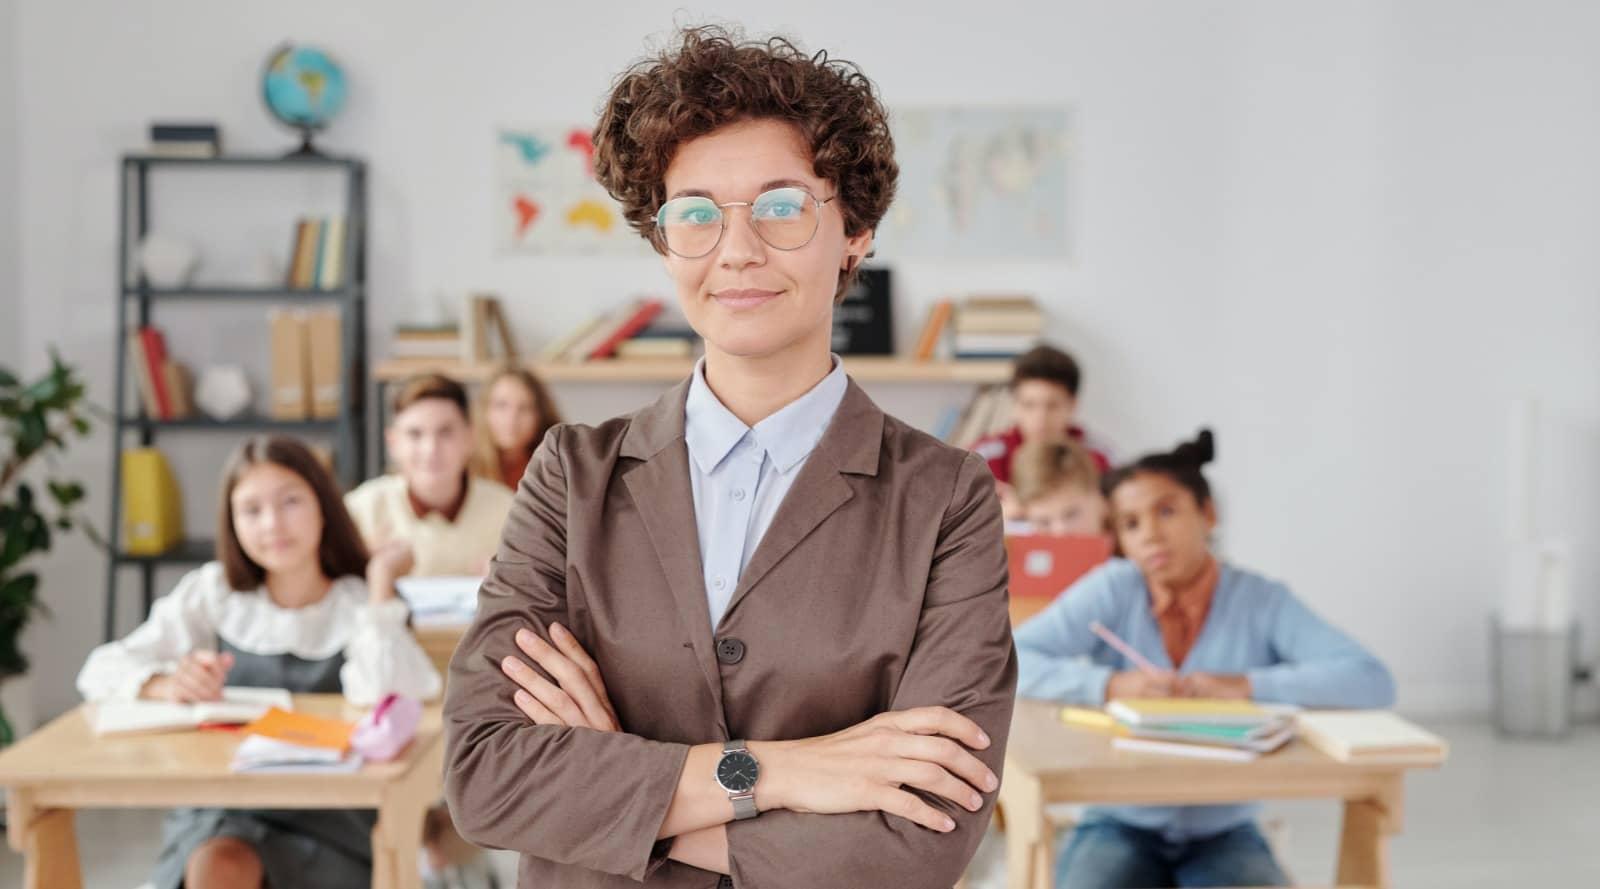 Elegir Educapeques para hacer tareas escolar